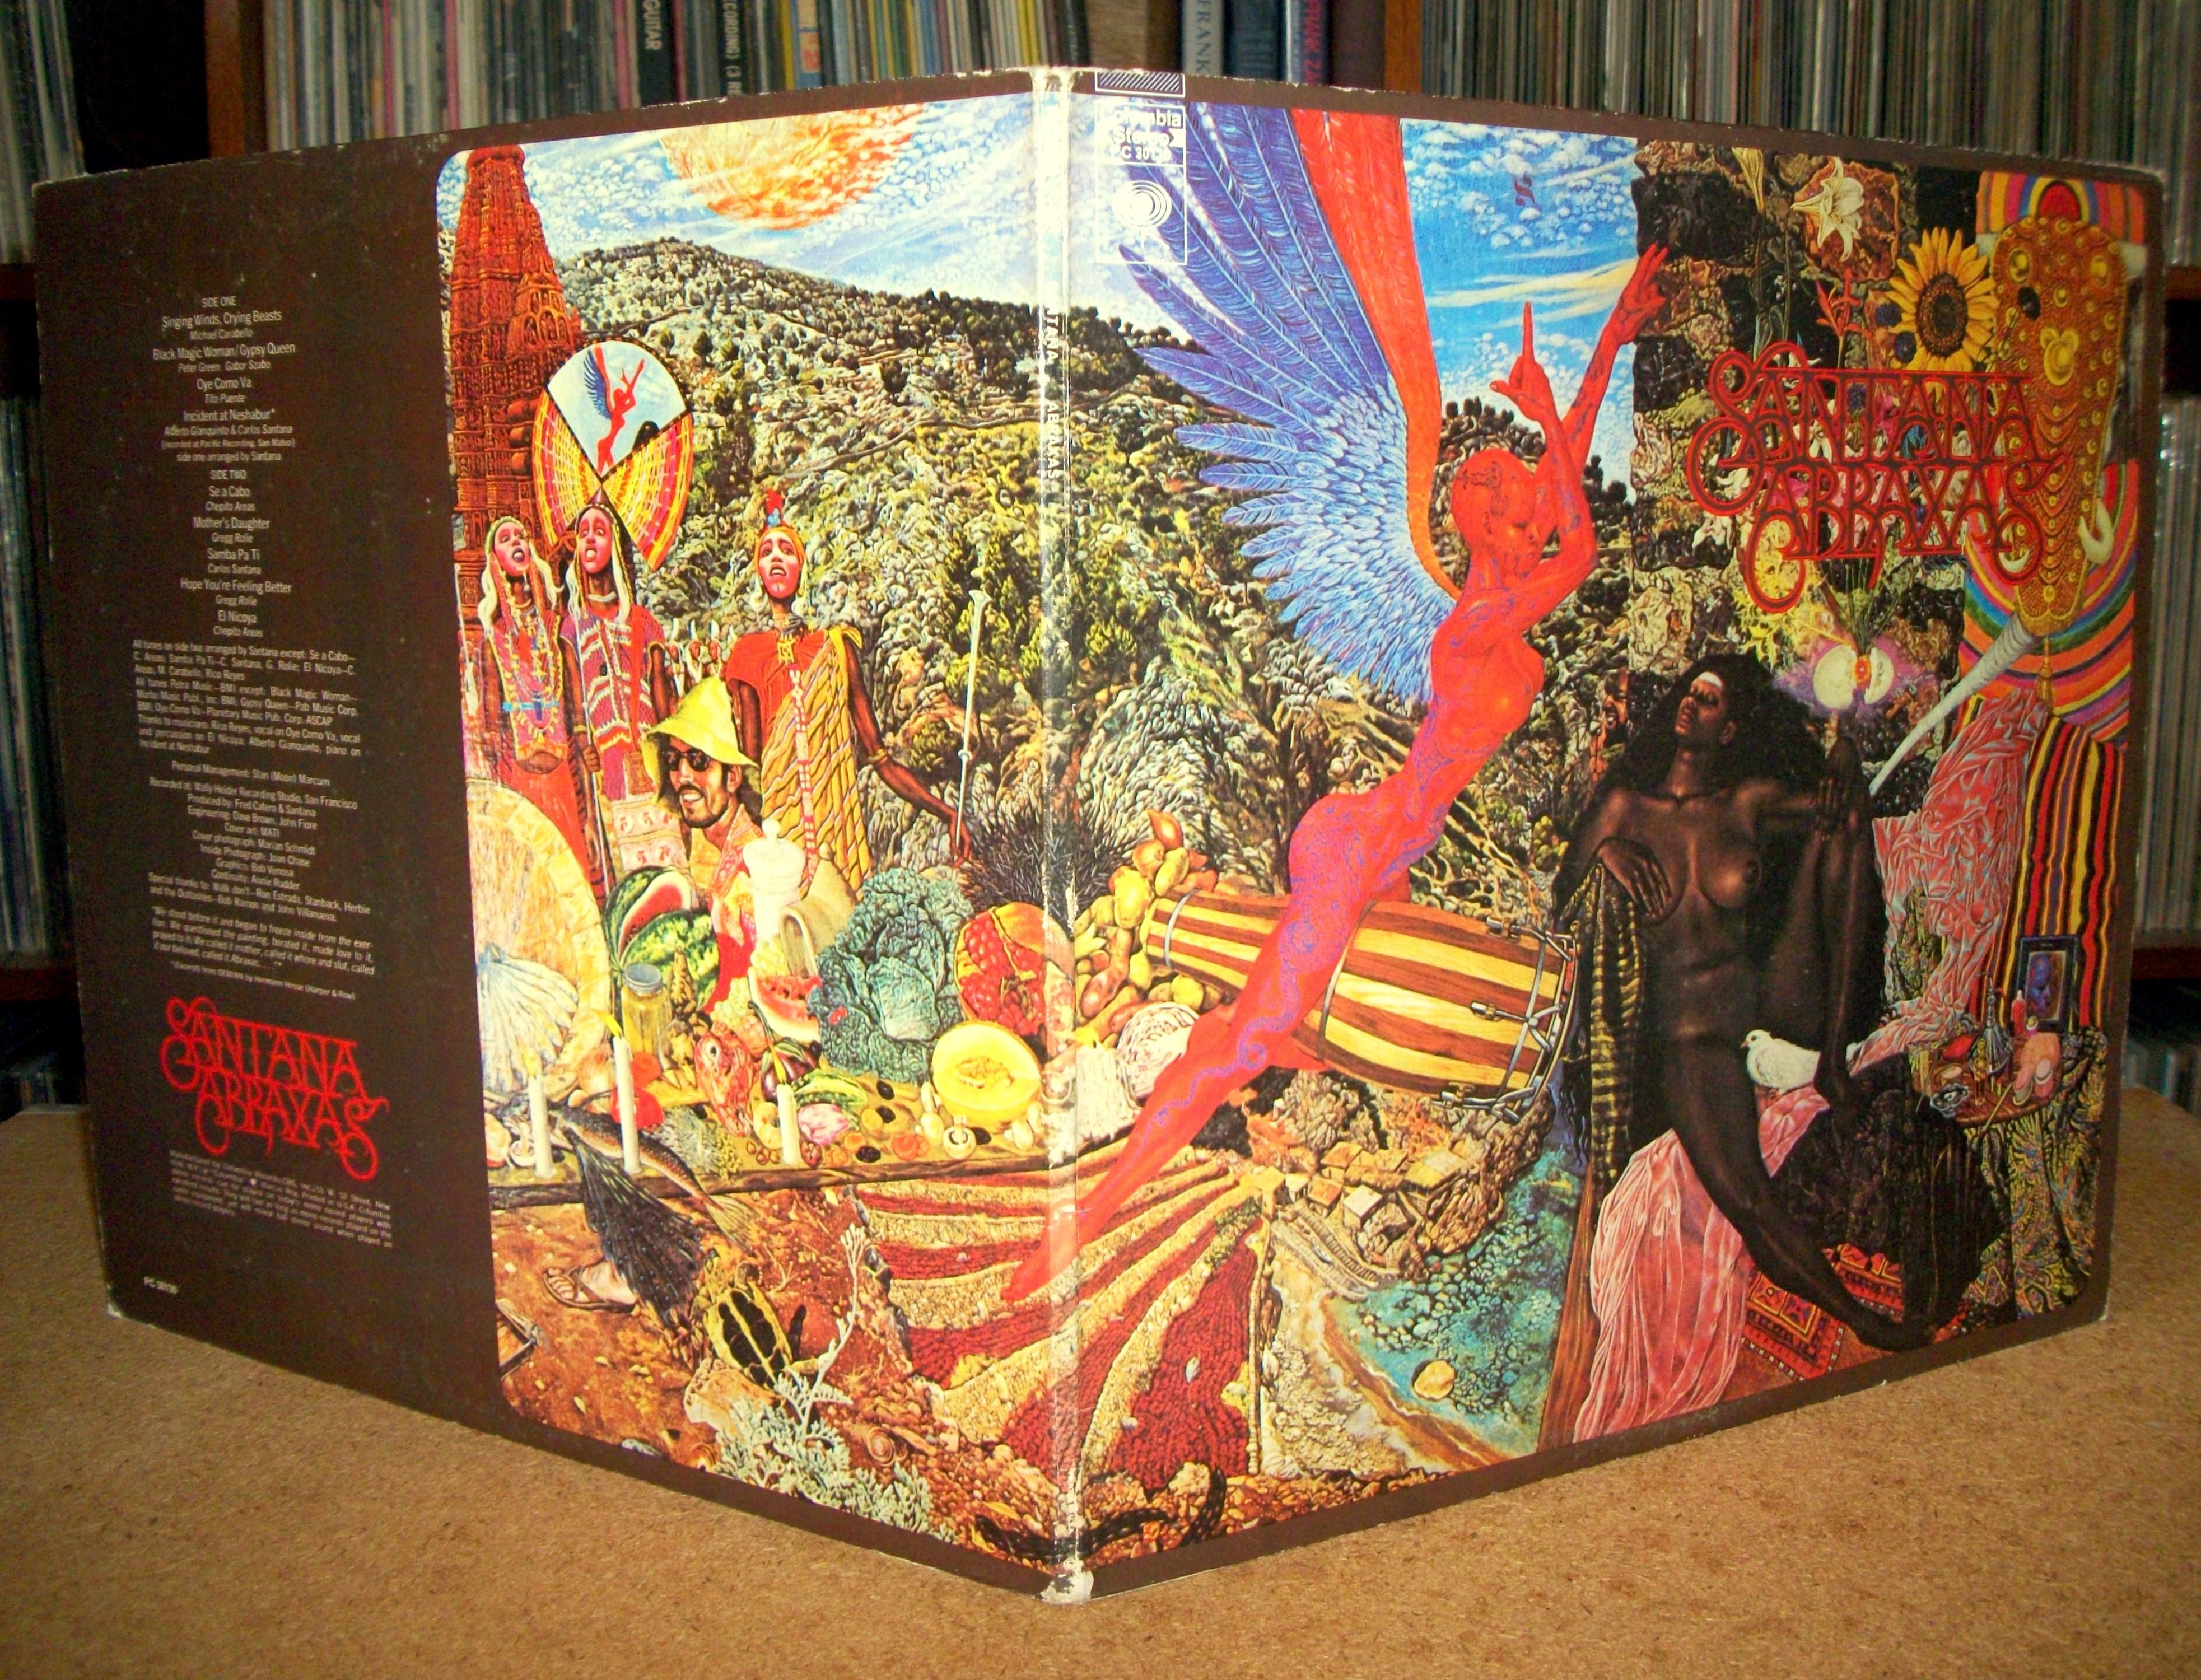 Sinister Vinyl Collection Santana Abraxas 1970